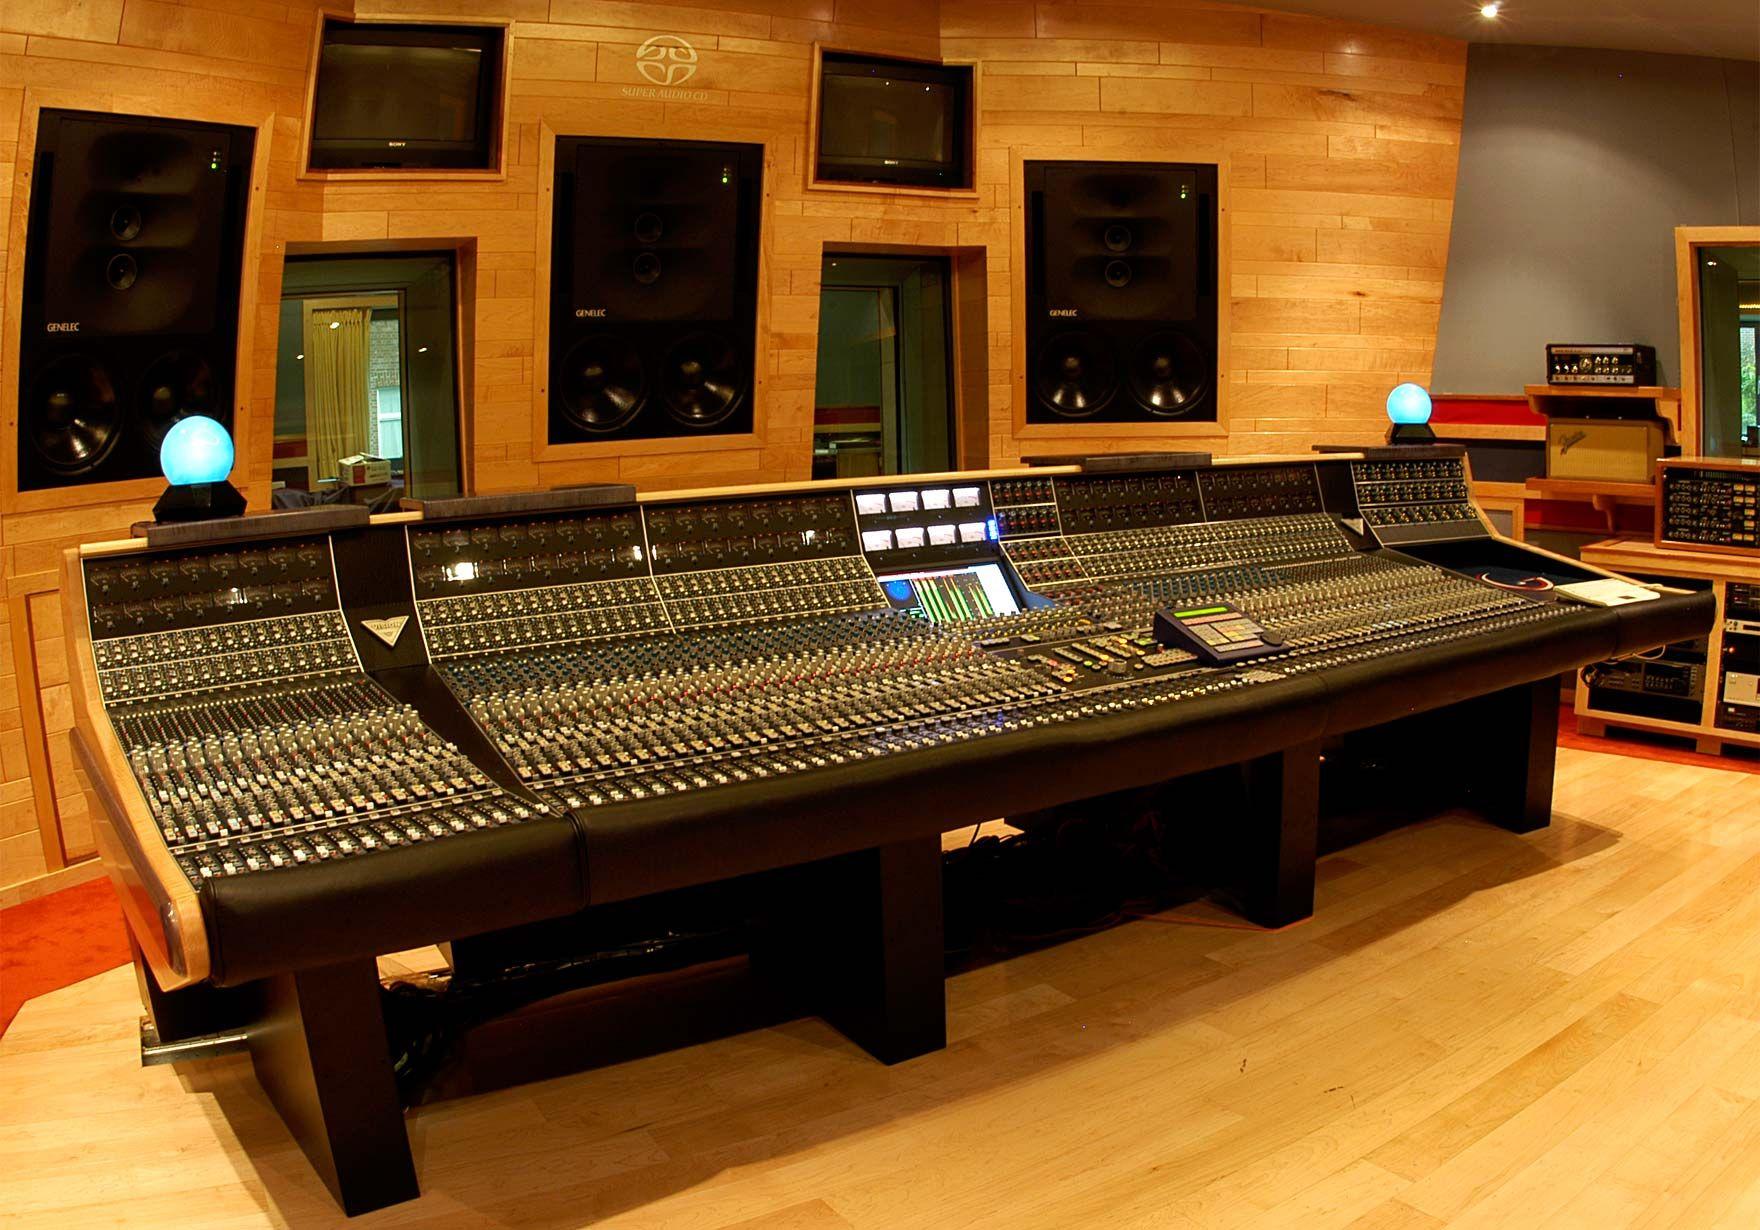 api vision all discrete surround mixing and recording console test board recording studio. Black Bedroom Furniture Sets. Home Design Ideas